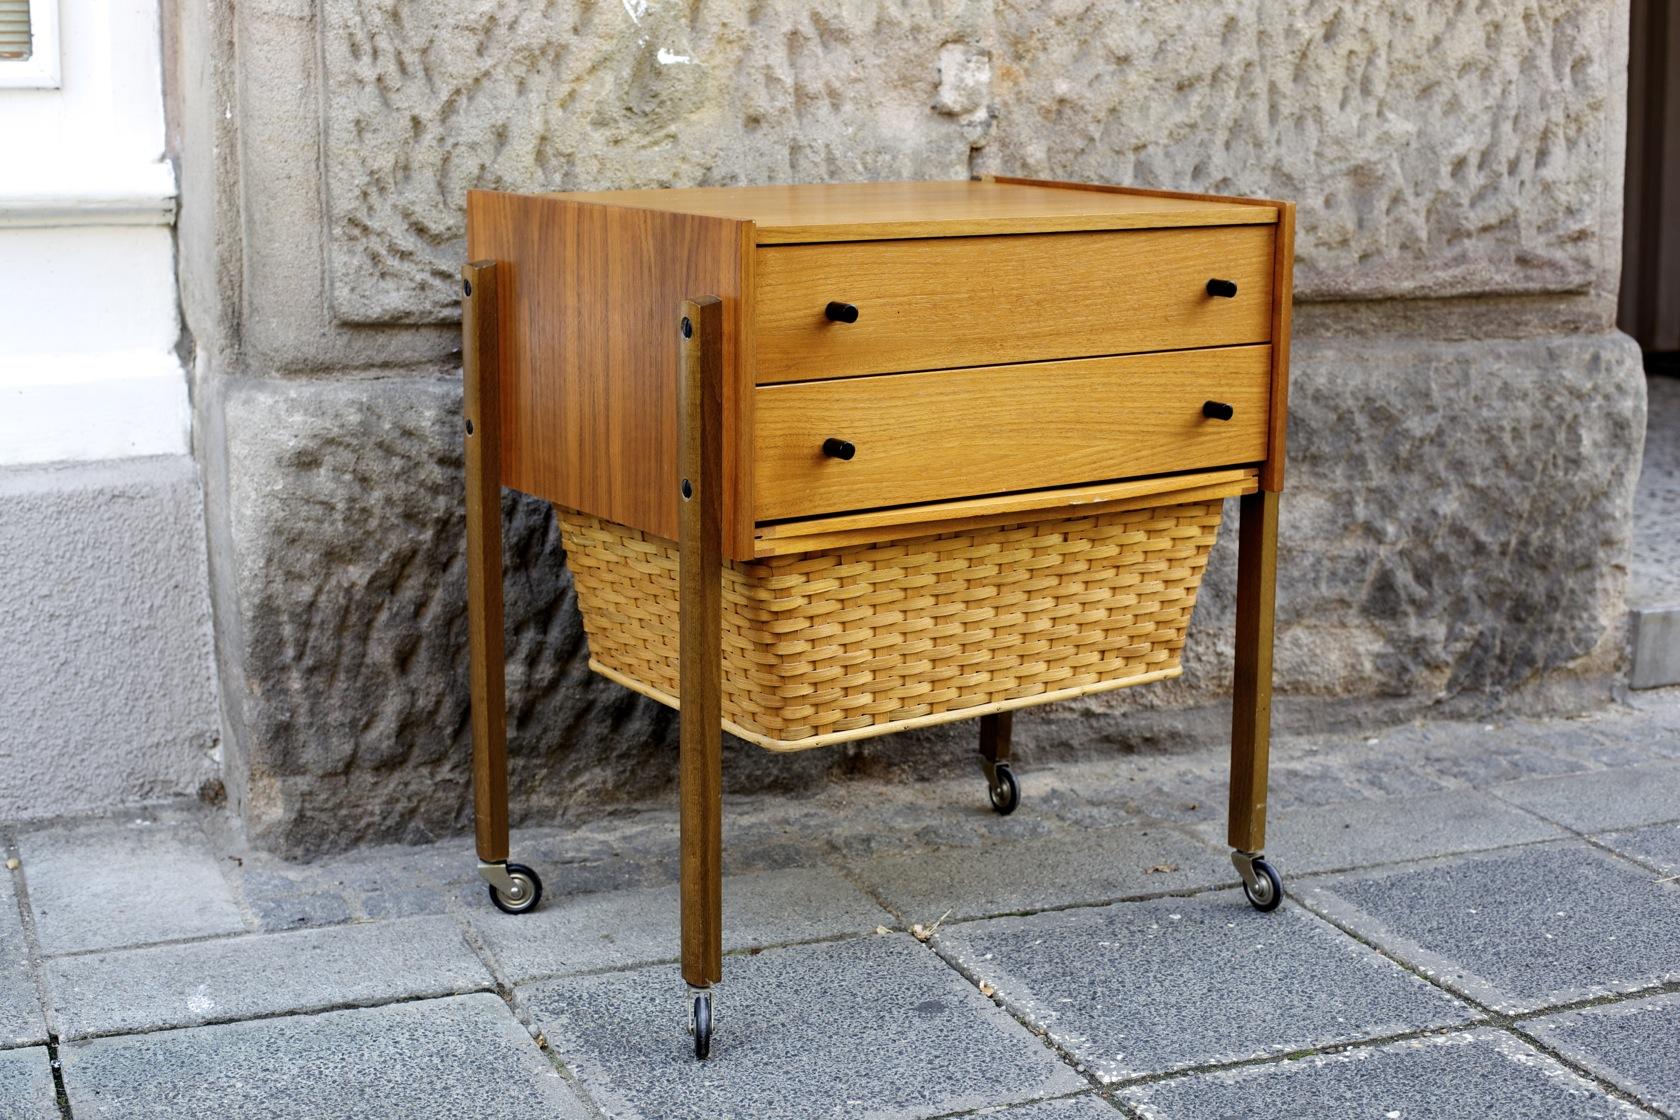 teak n hk stchen mit wollkorb raumwunder vintage wohnen in n rnberg. Black Bedroom Furniture Sets. Home Design Ideas